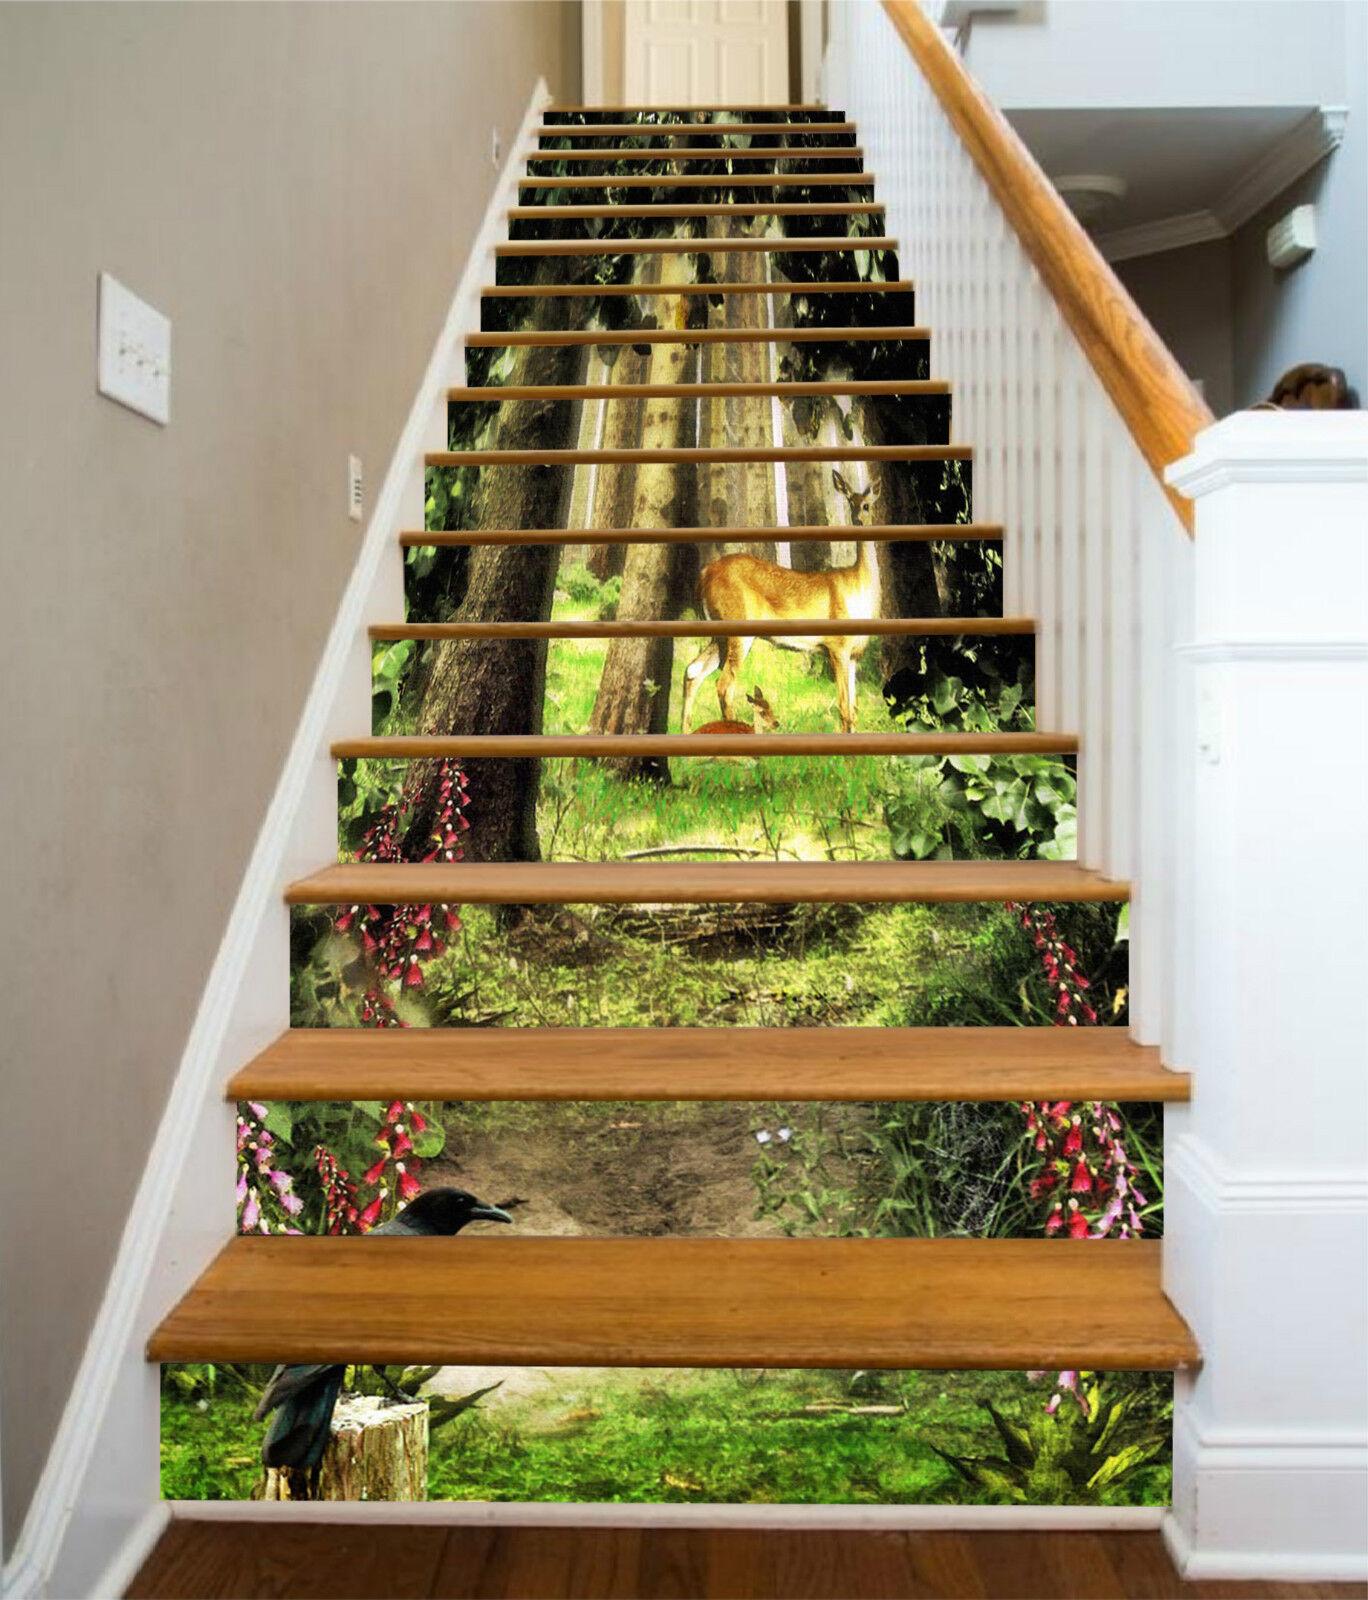 3D Tiere Im Wald 31 Stair Risers Dekoration Fototapete Vinyl Aufkleber Tapete DE